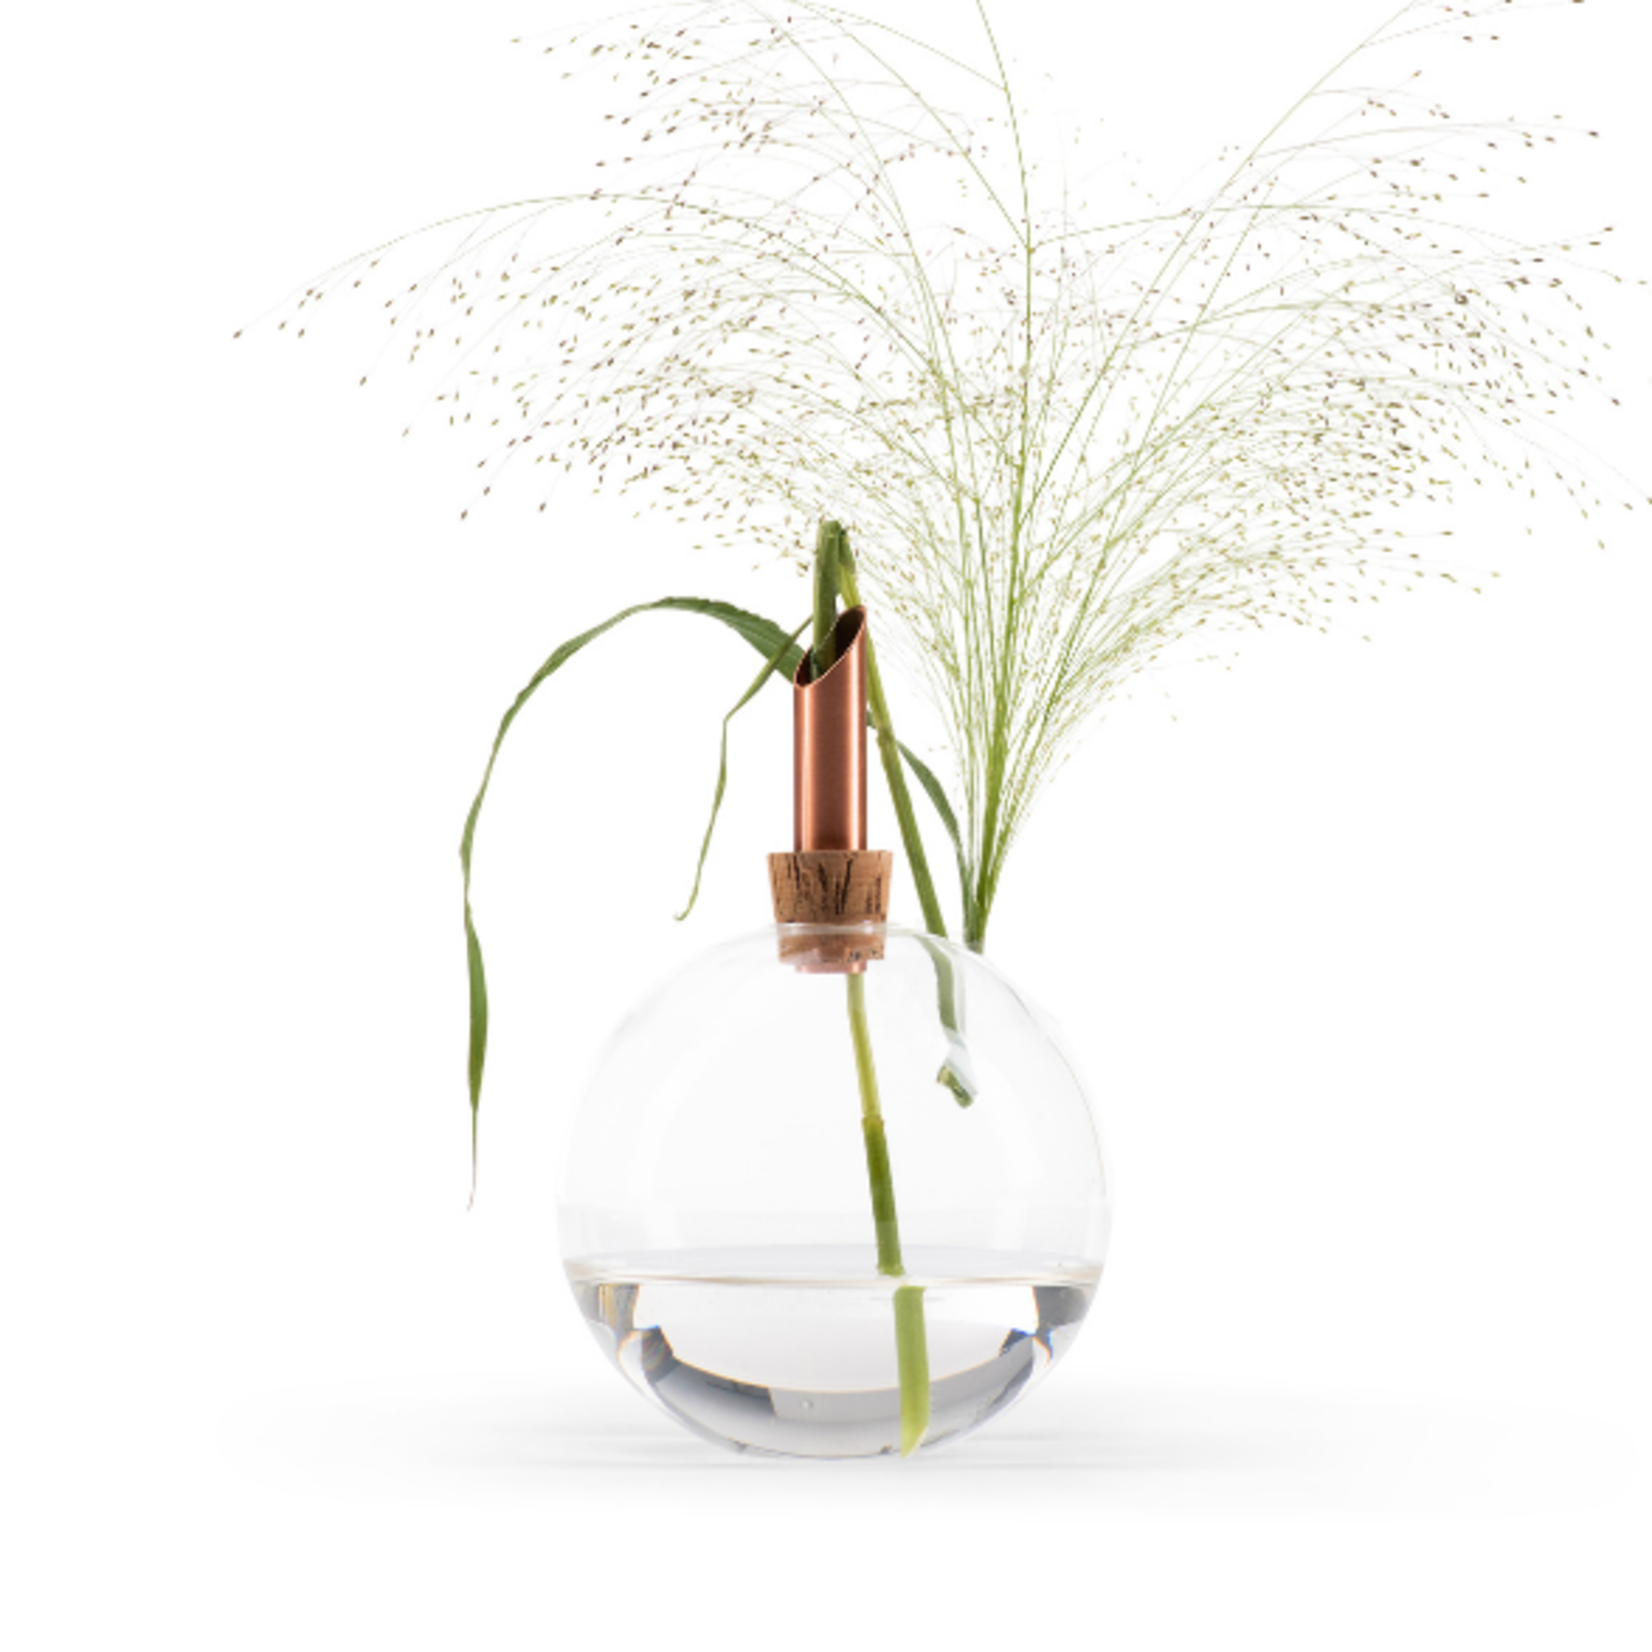 scandinavia form scandinavia form - glasilium vase - large